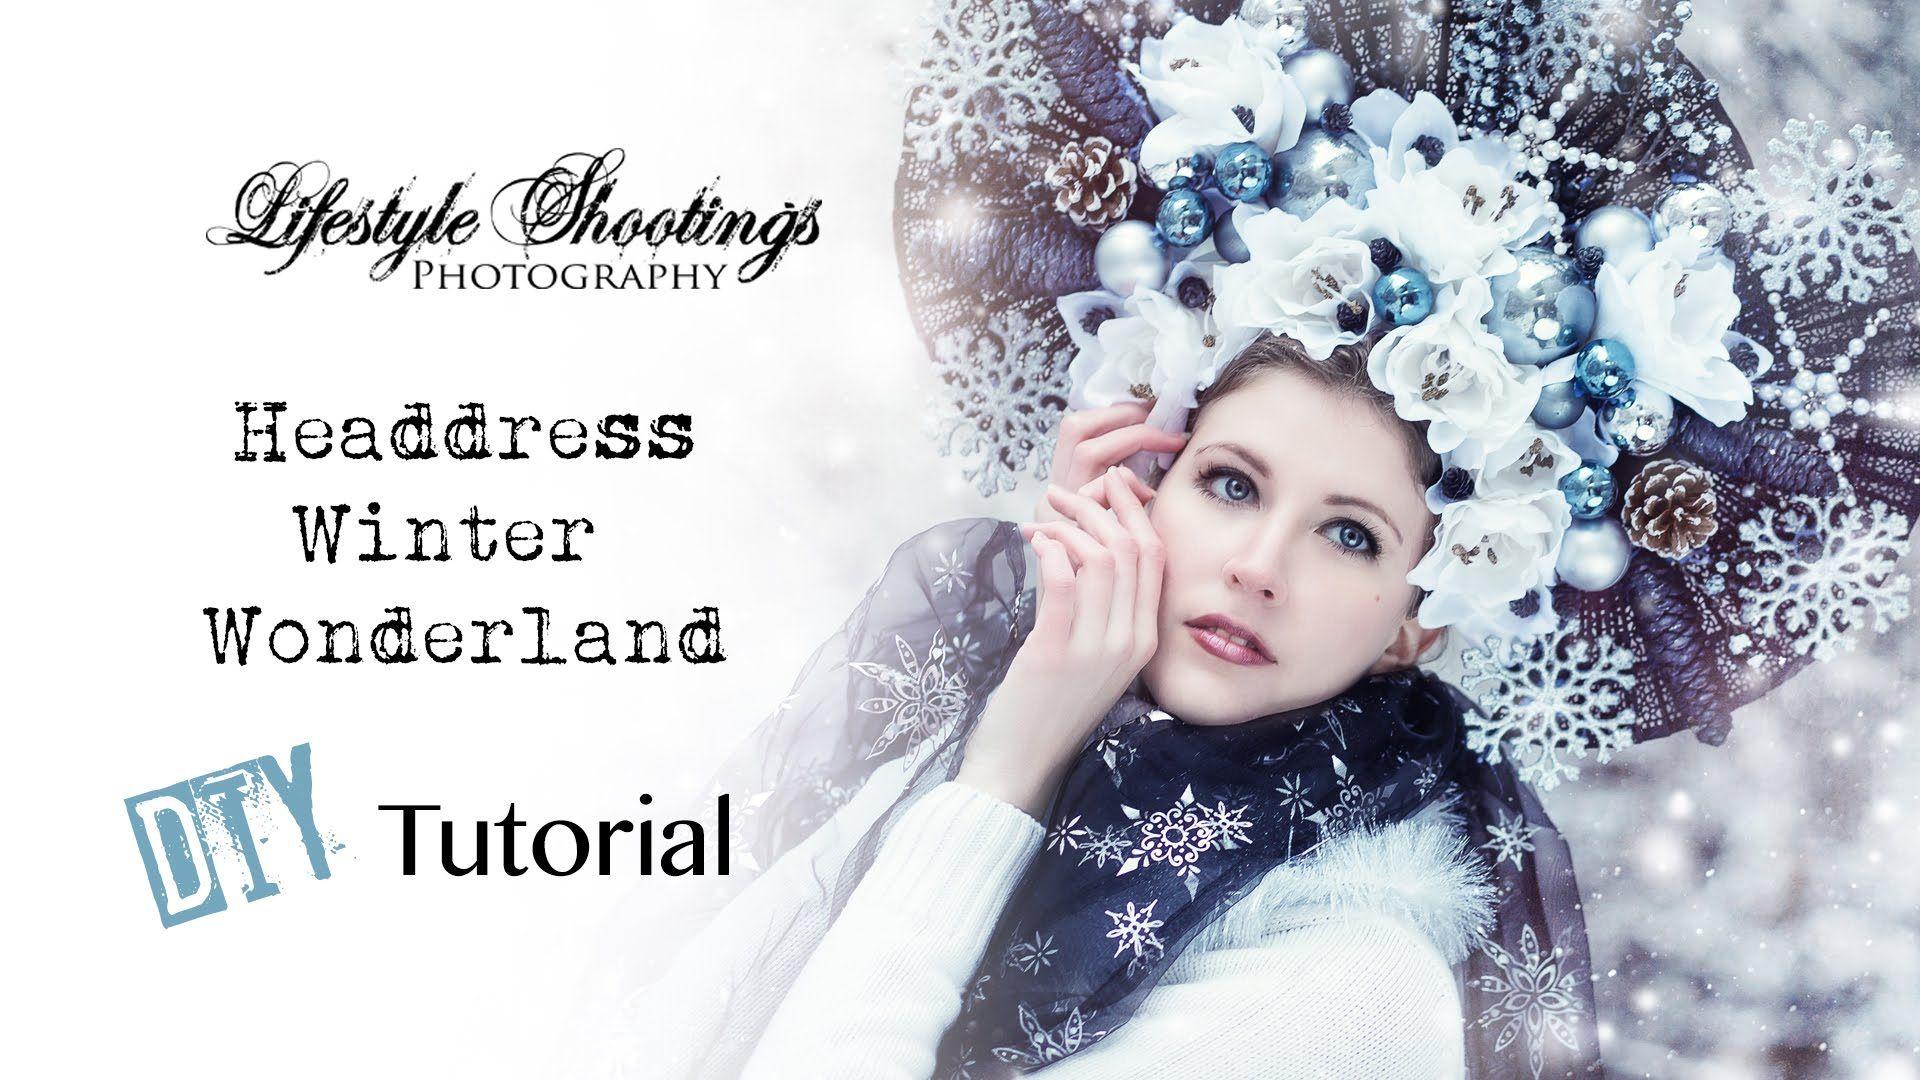 Headdress Tutorial - Winter Wonderland